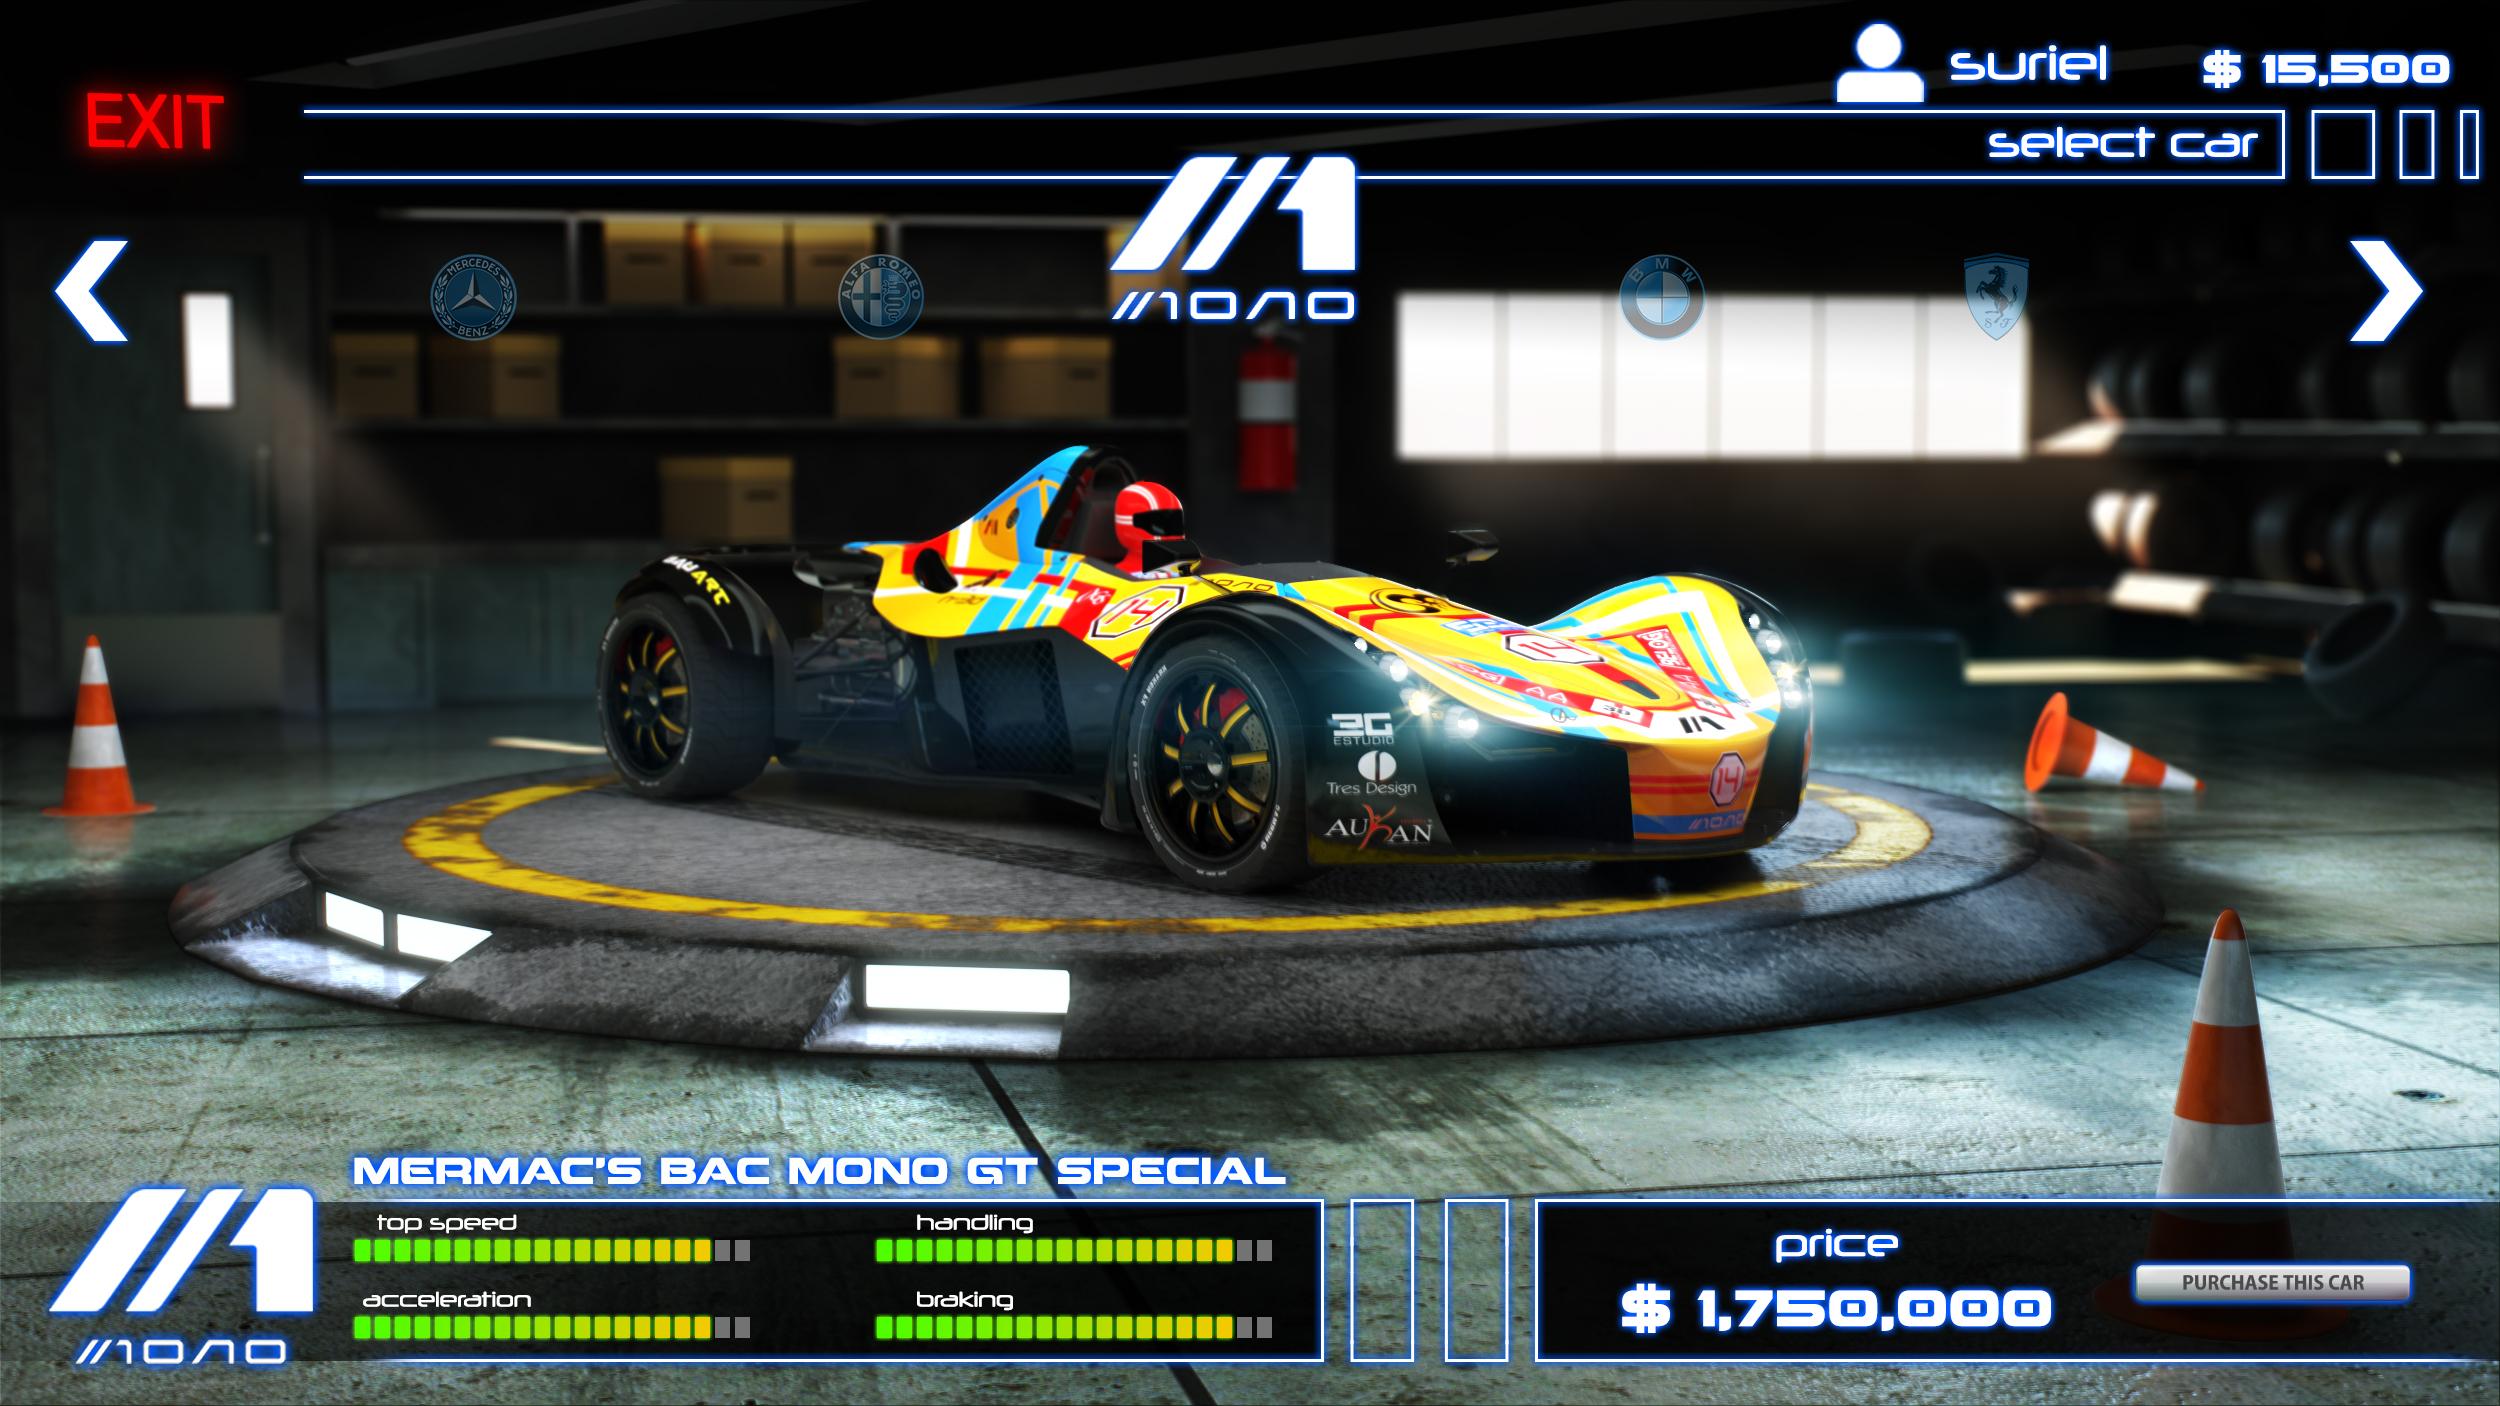 Mermac's Bac Mono GT Special 3d art